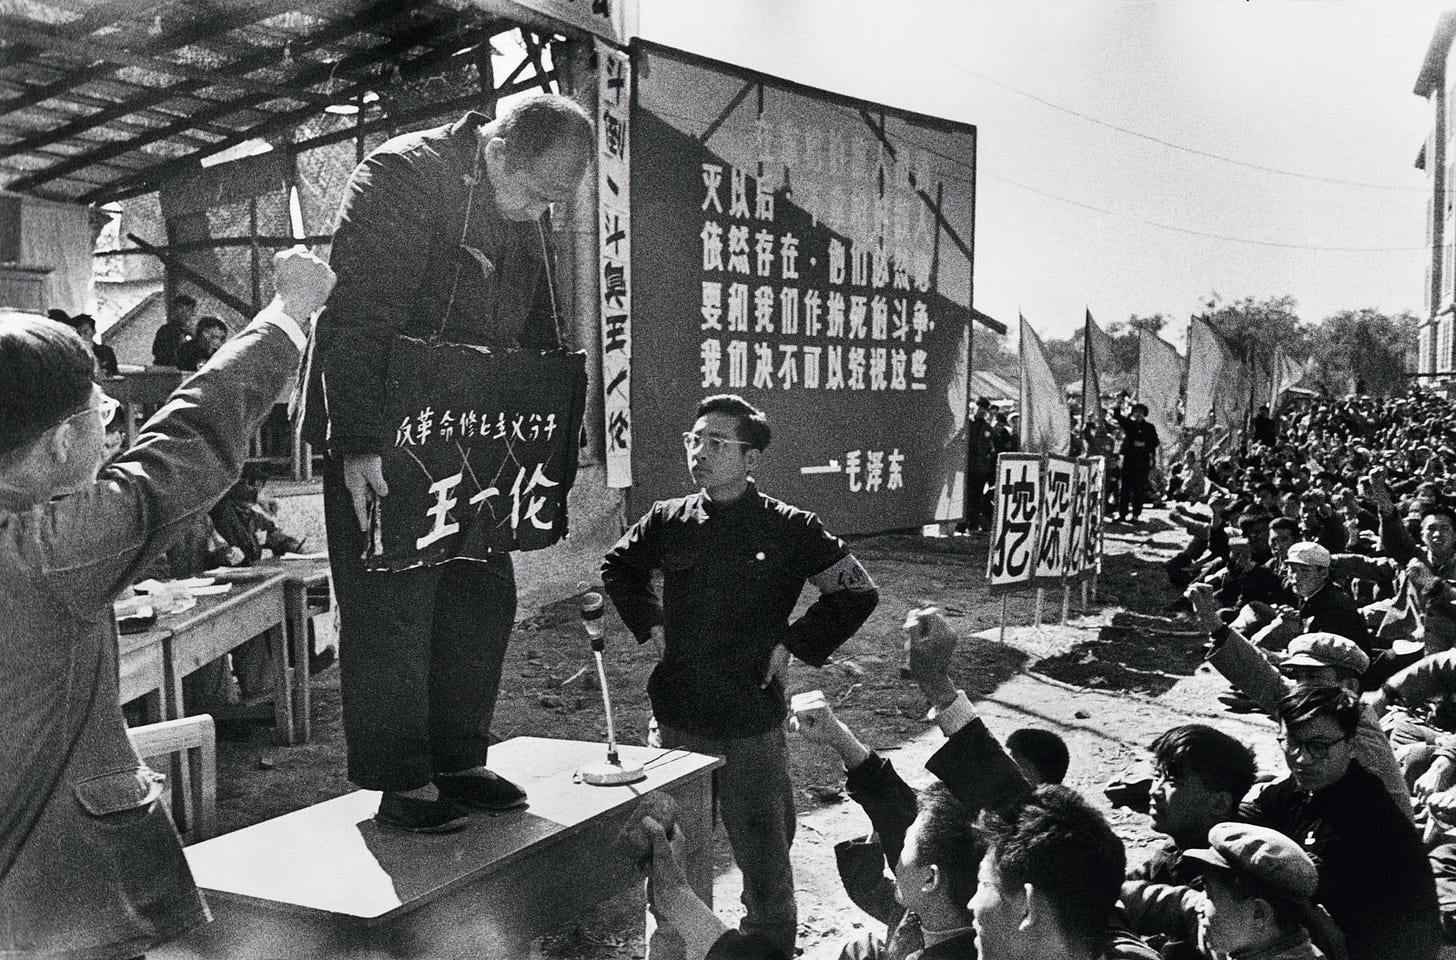 http://www.nybooks.com/wp-content/uploads/2016/01/li-zhensheng.jpg